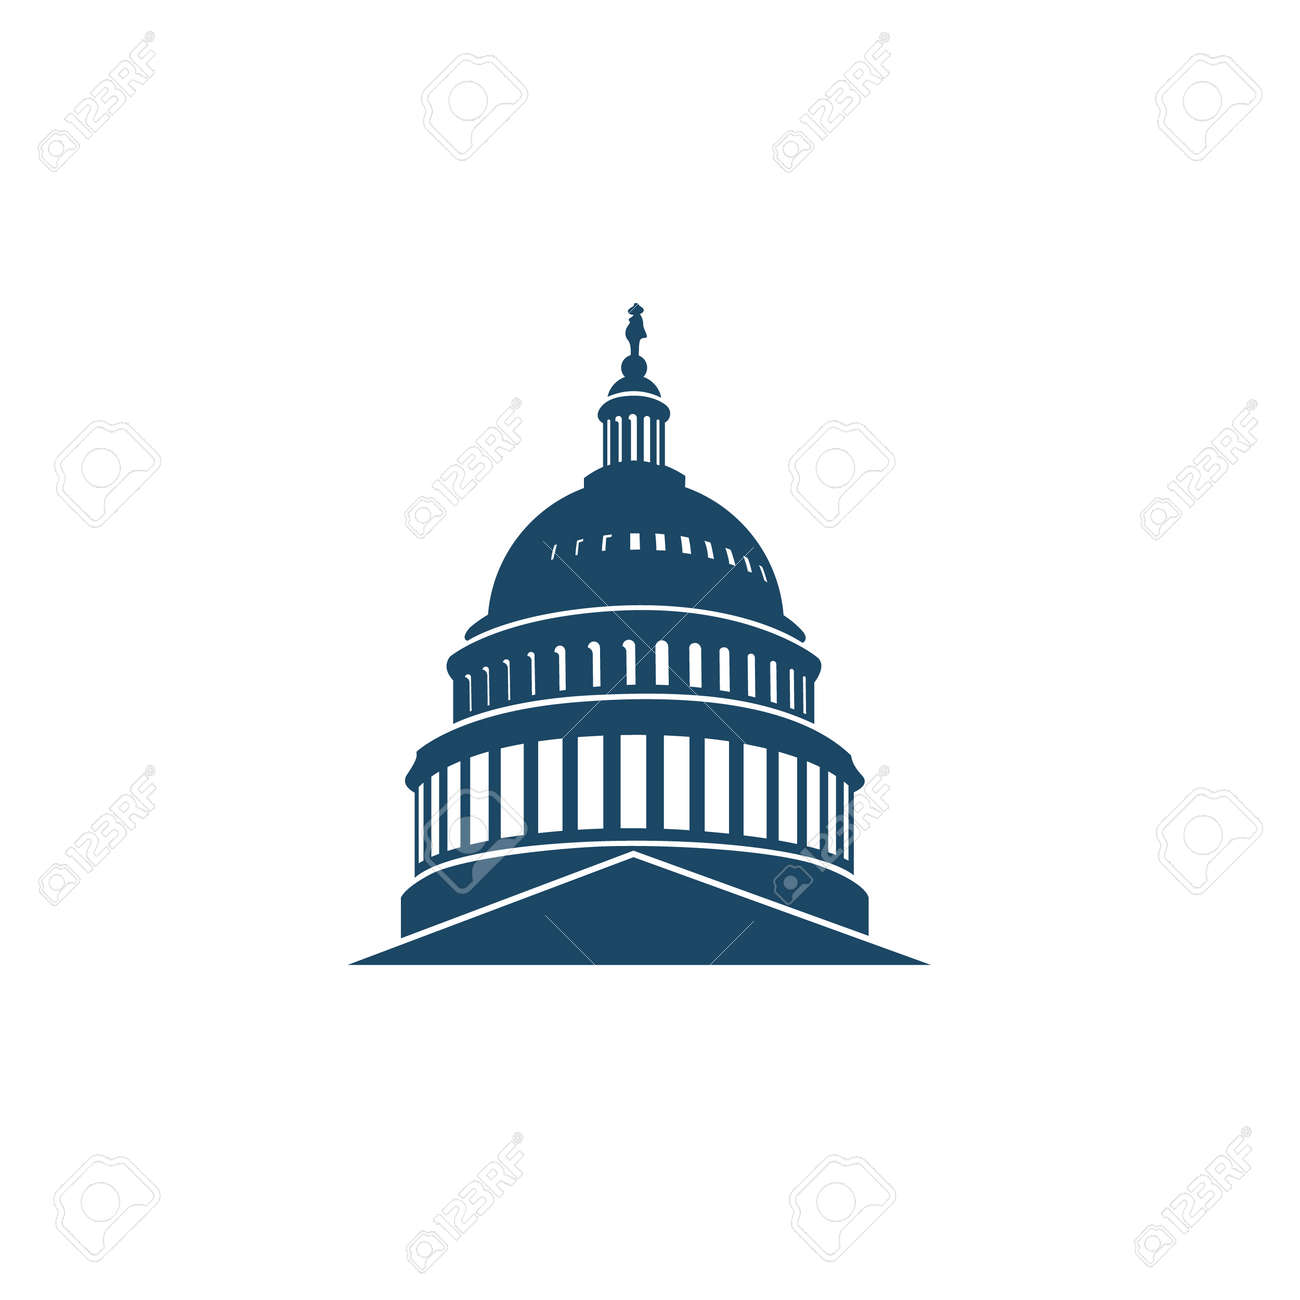 United States Capitol building icon in Washington DC - 104411568